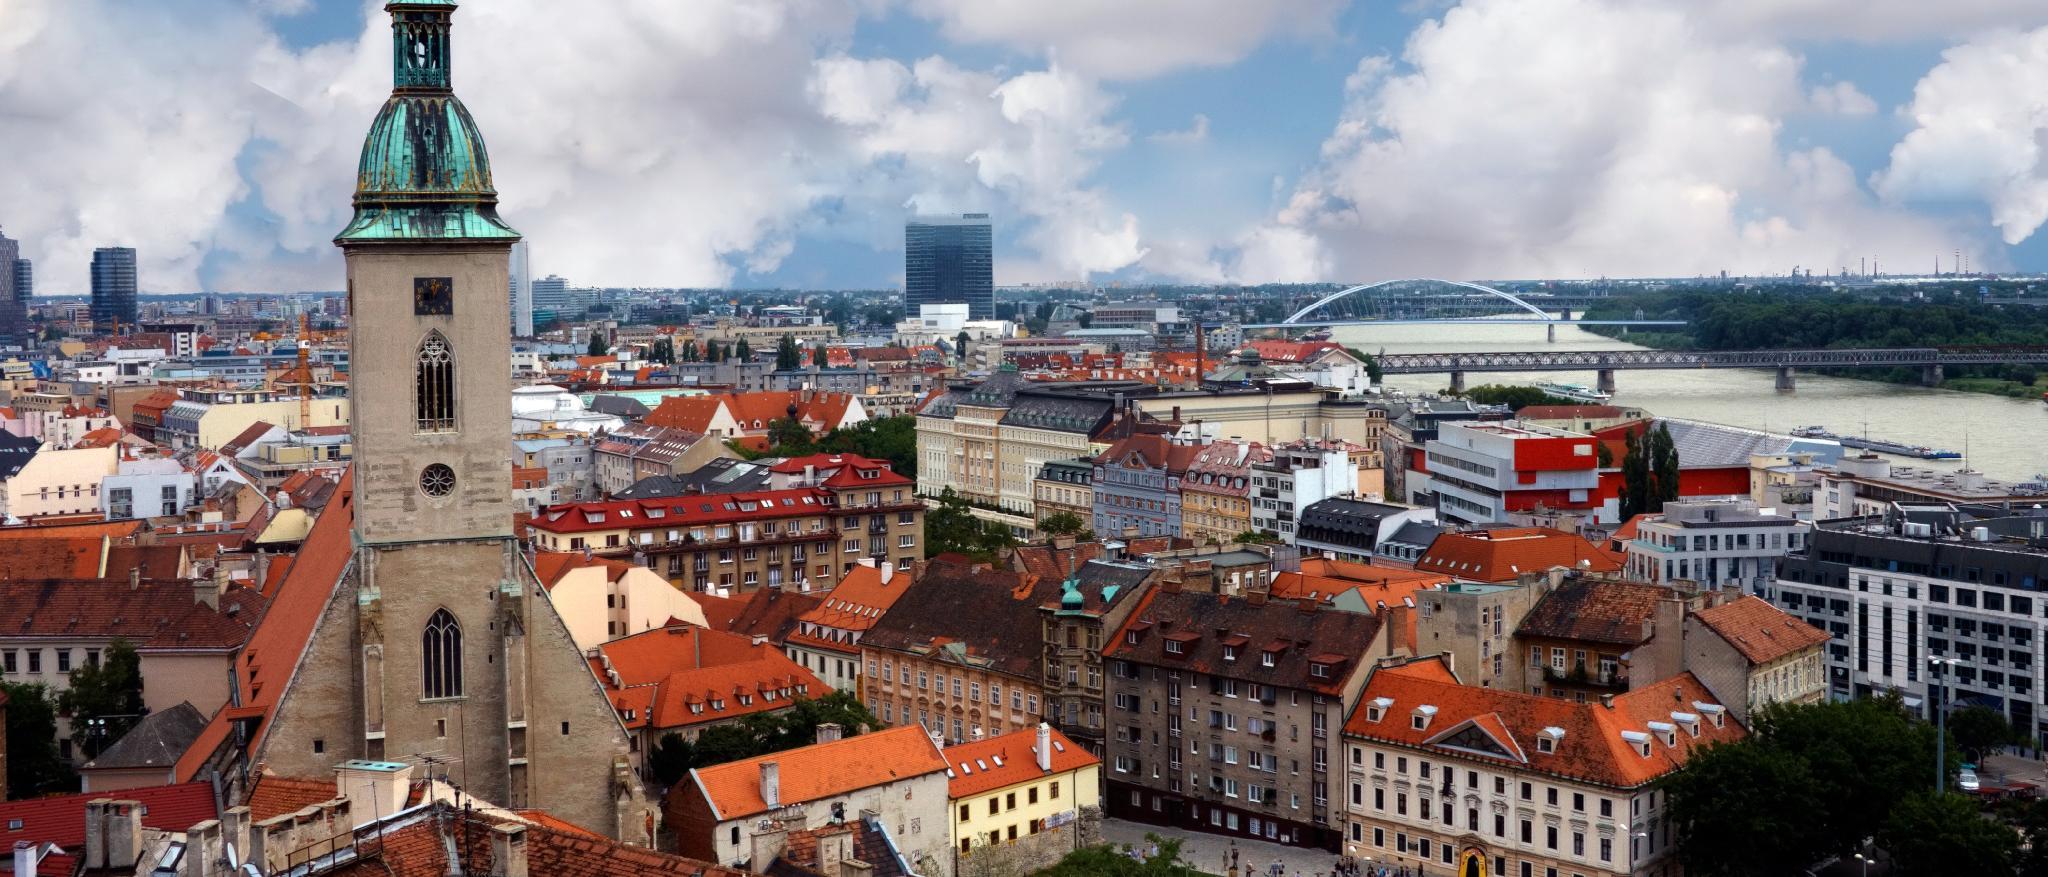 10 best bratislava hotels hd photos reviews of hotels in bratislava slovakia. Black Bedroom Furniture Sets. Home Design Ideas